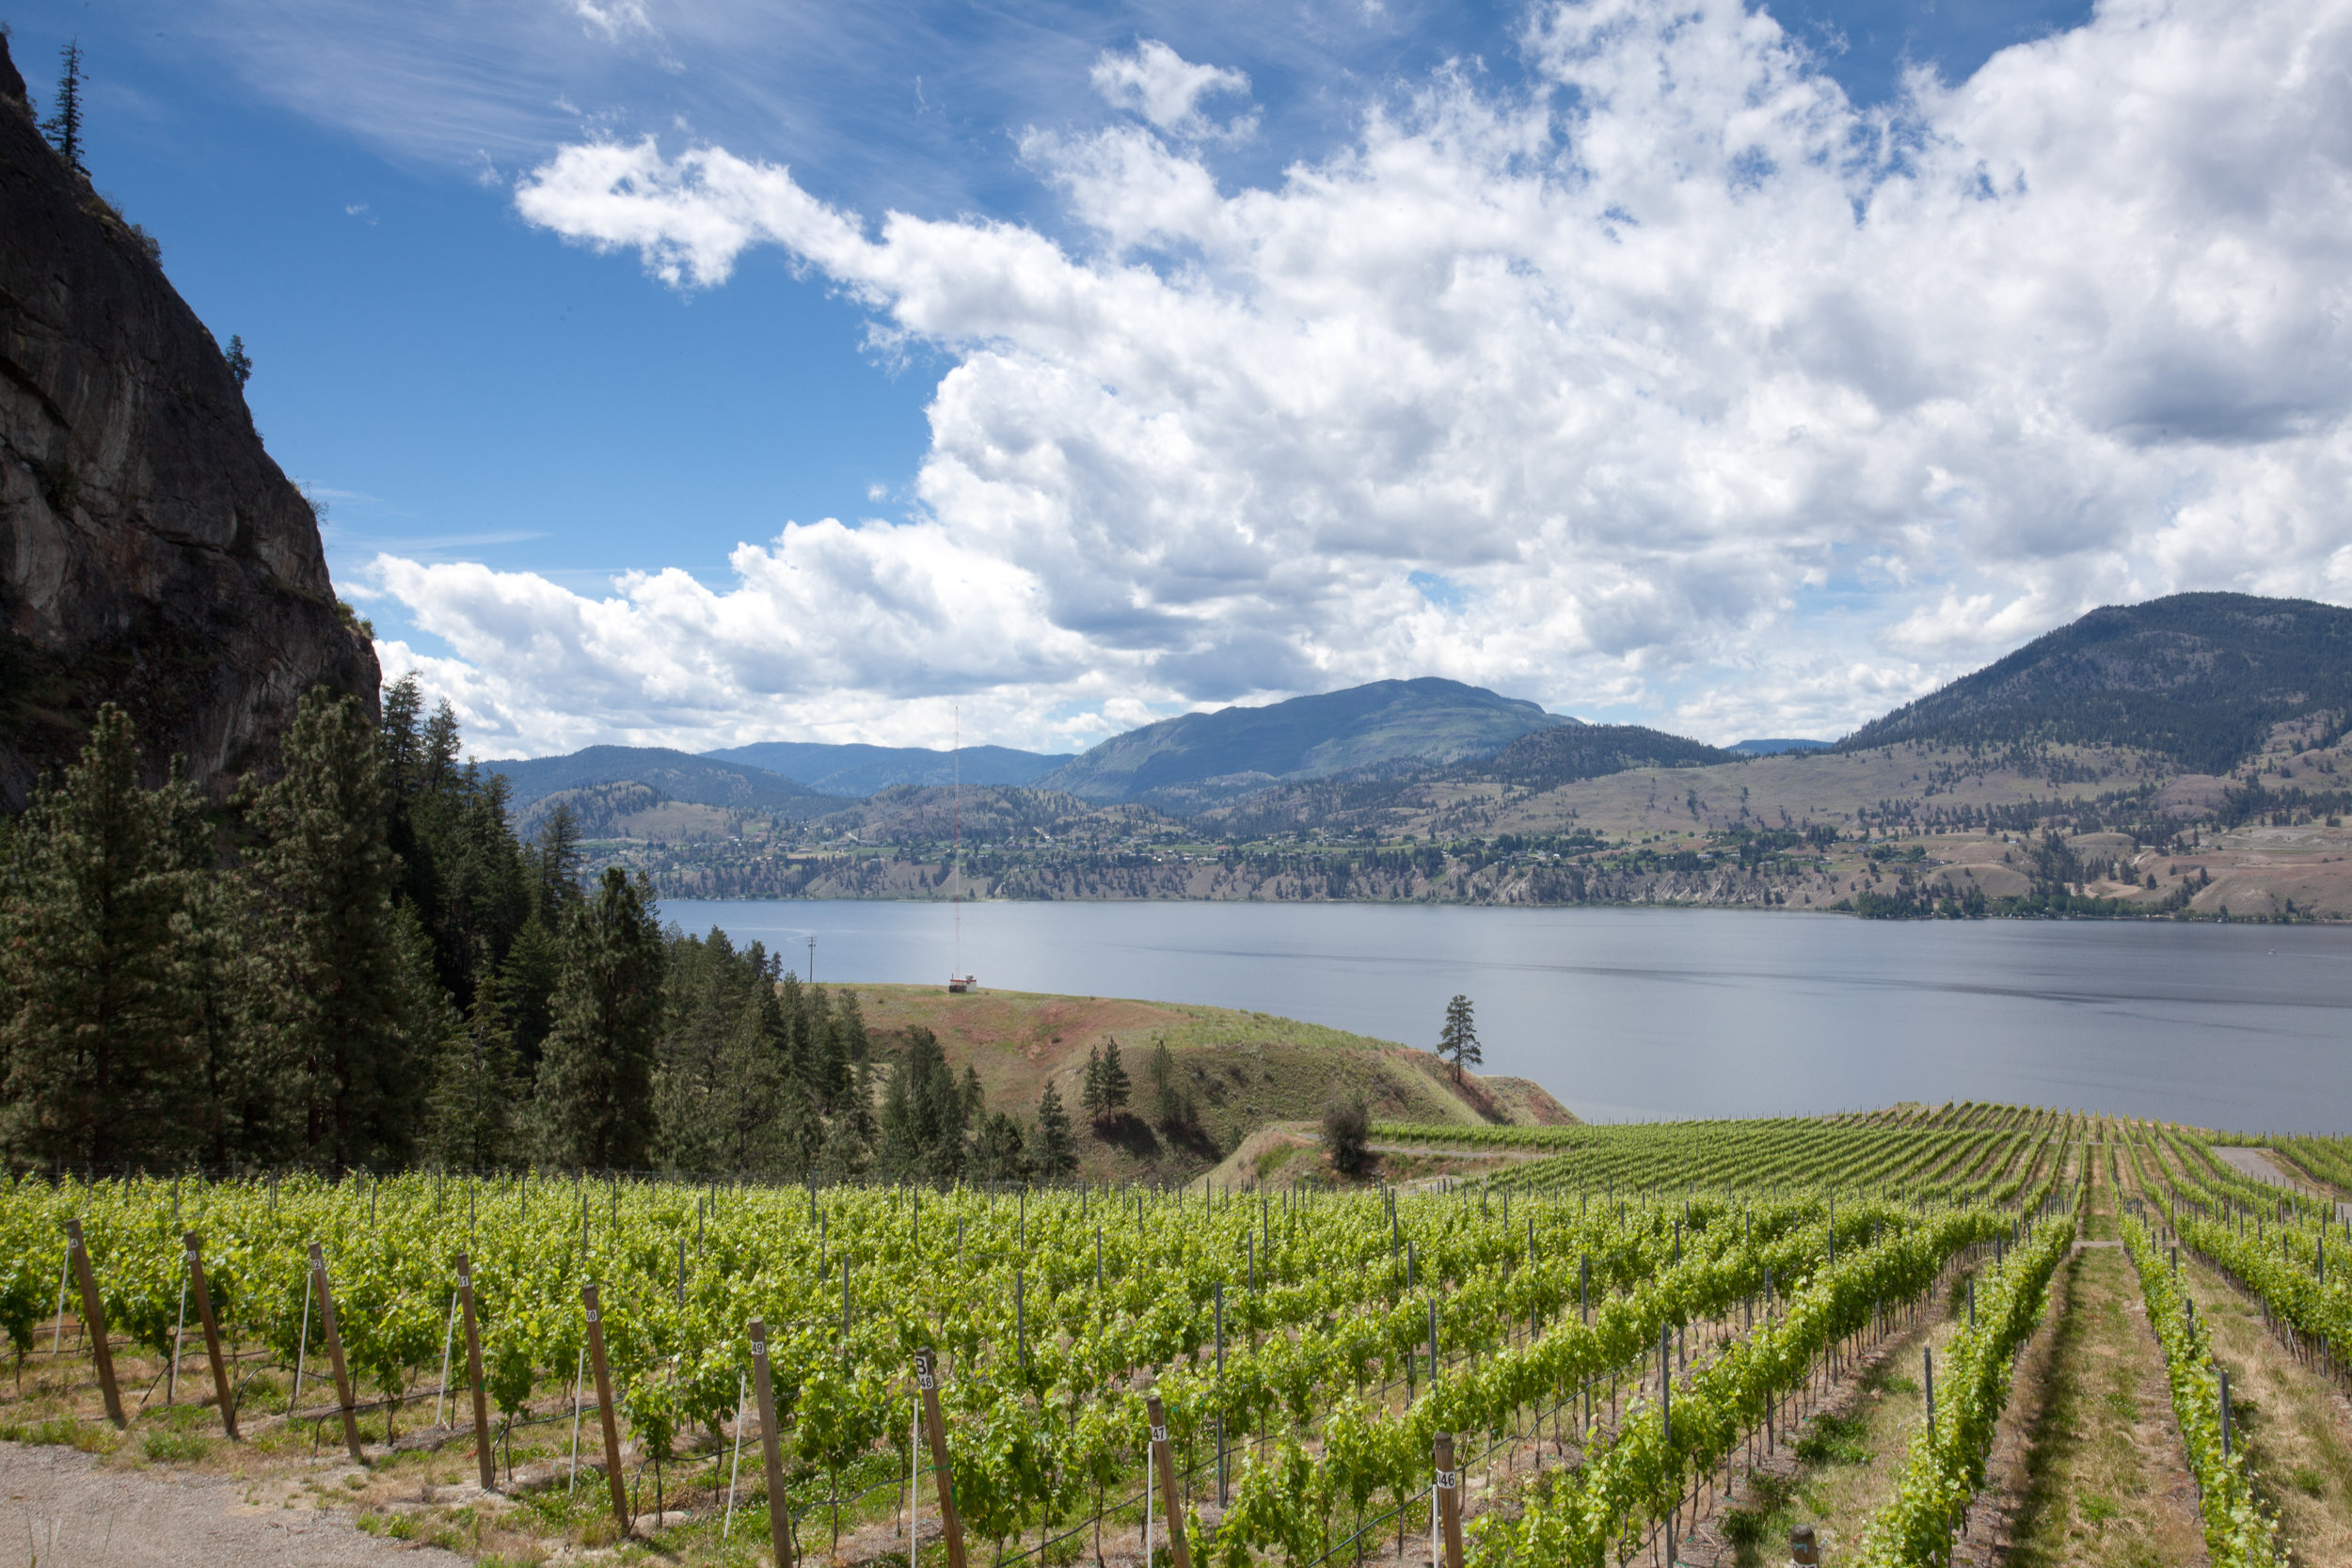 Okanagan Falls Winery in the Okanagan Valley wine region on Ashleyfisher.ca